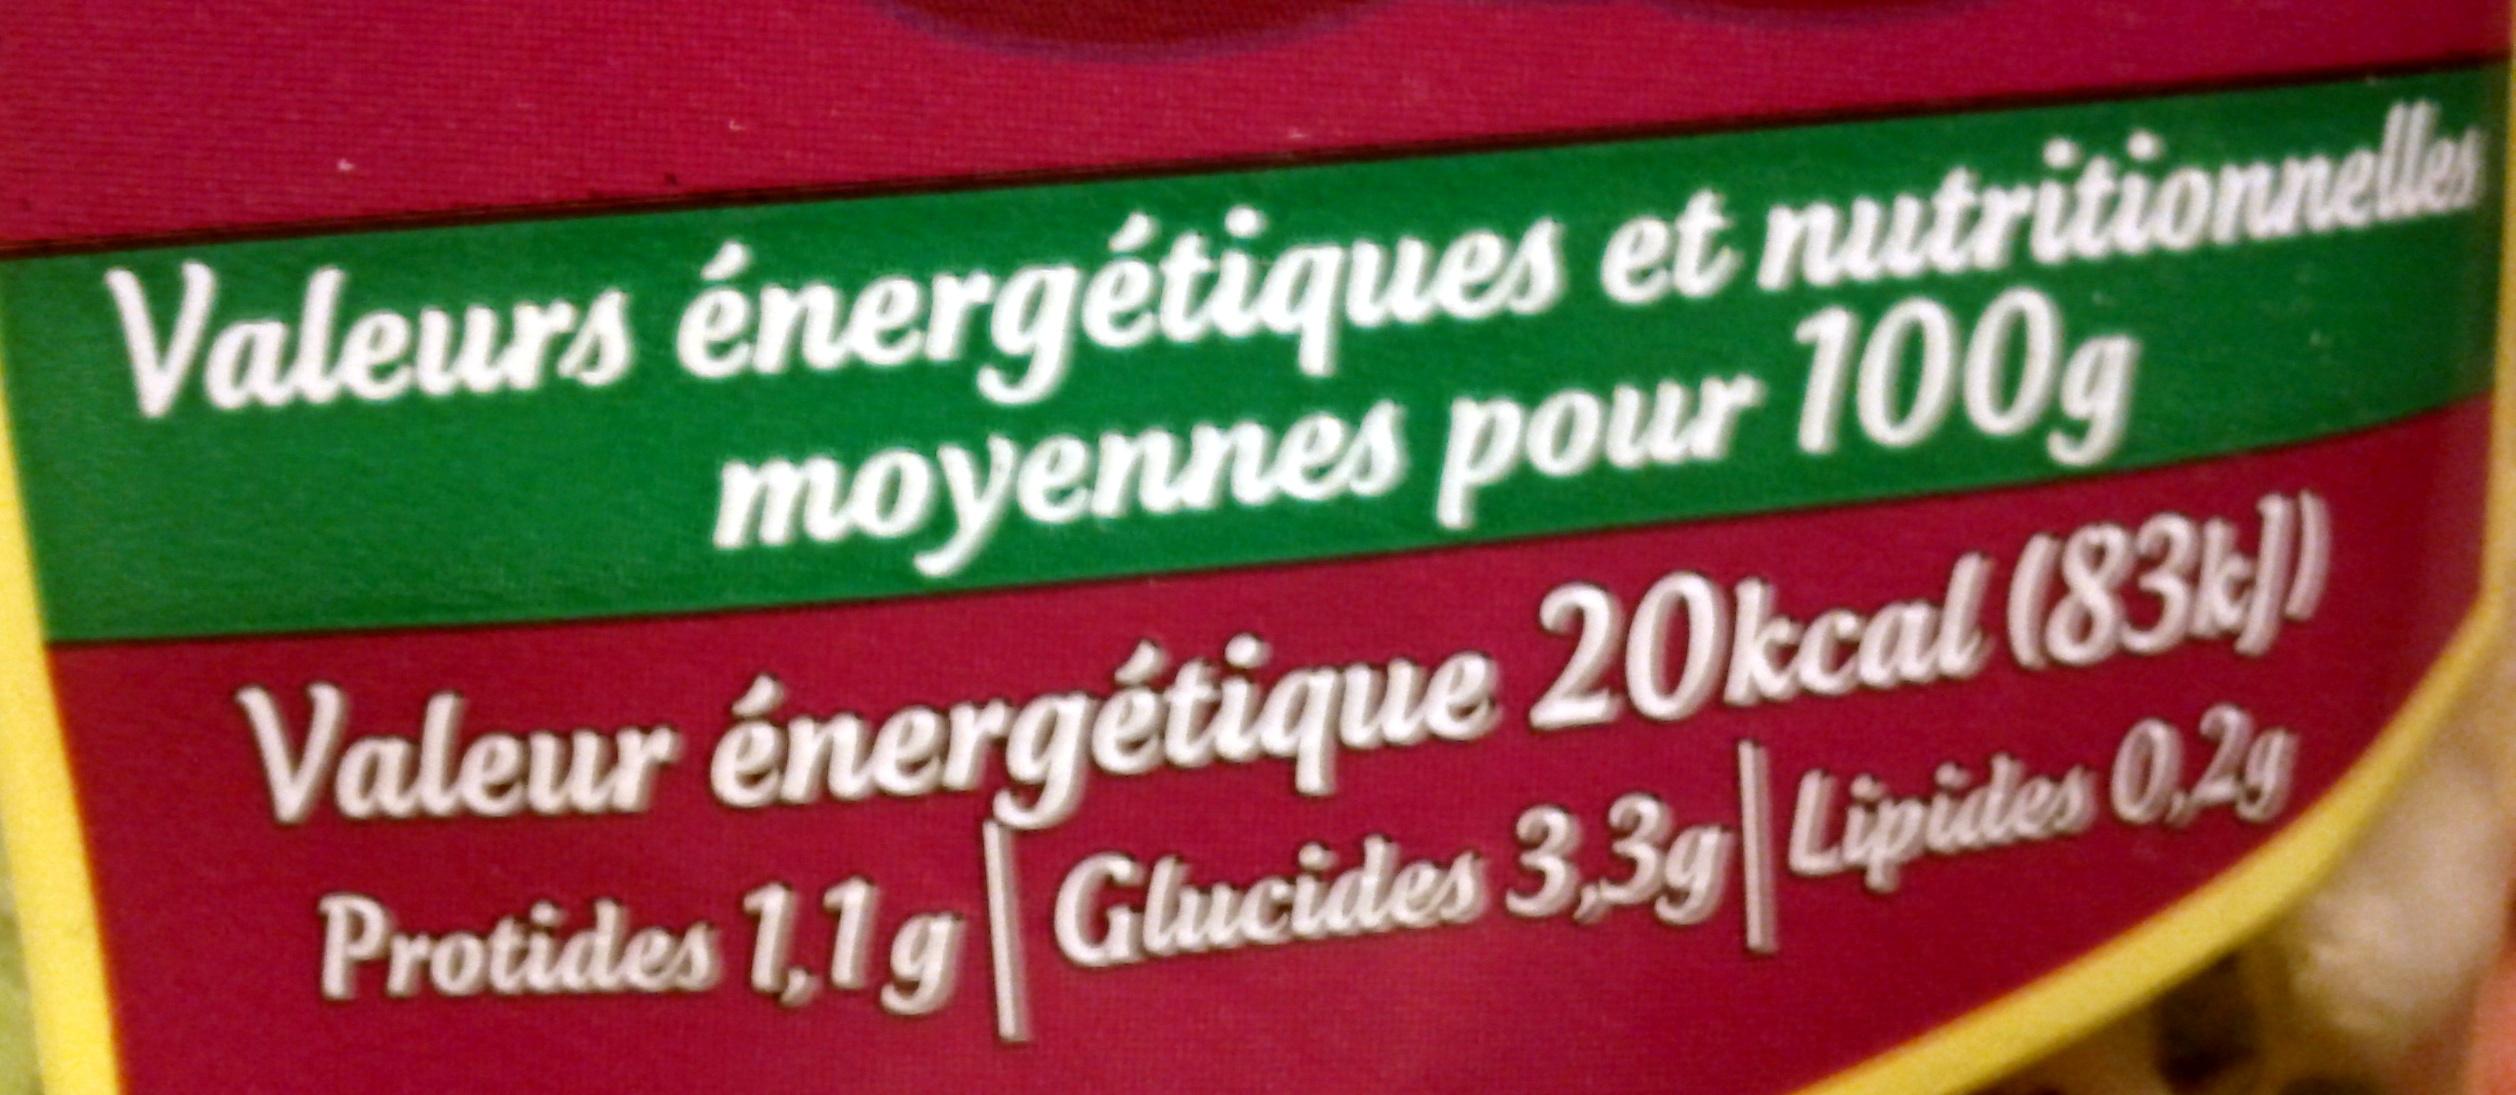 Les Crudettes - Mélange gourmand - Voedigswaarden